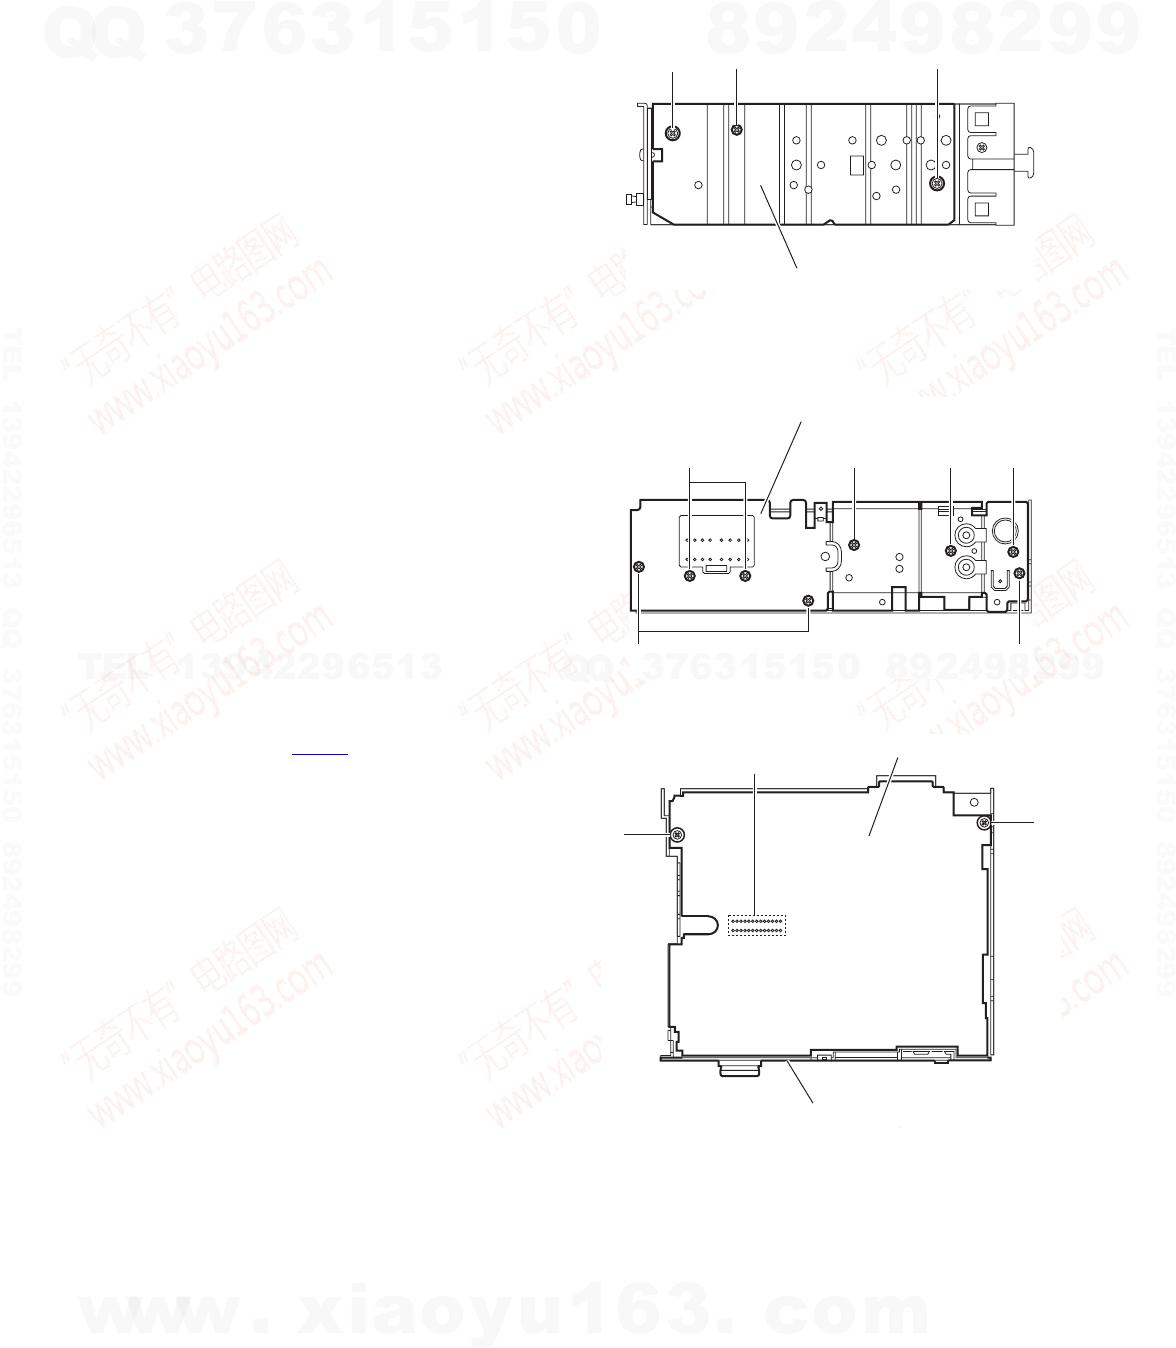 Ma121 Kd S11 2013070449 Jvc G110 Wiring Diagram 1 8 Noma121